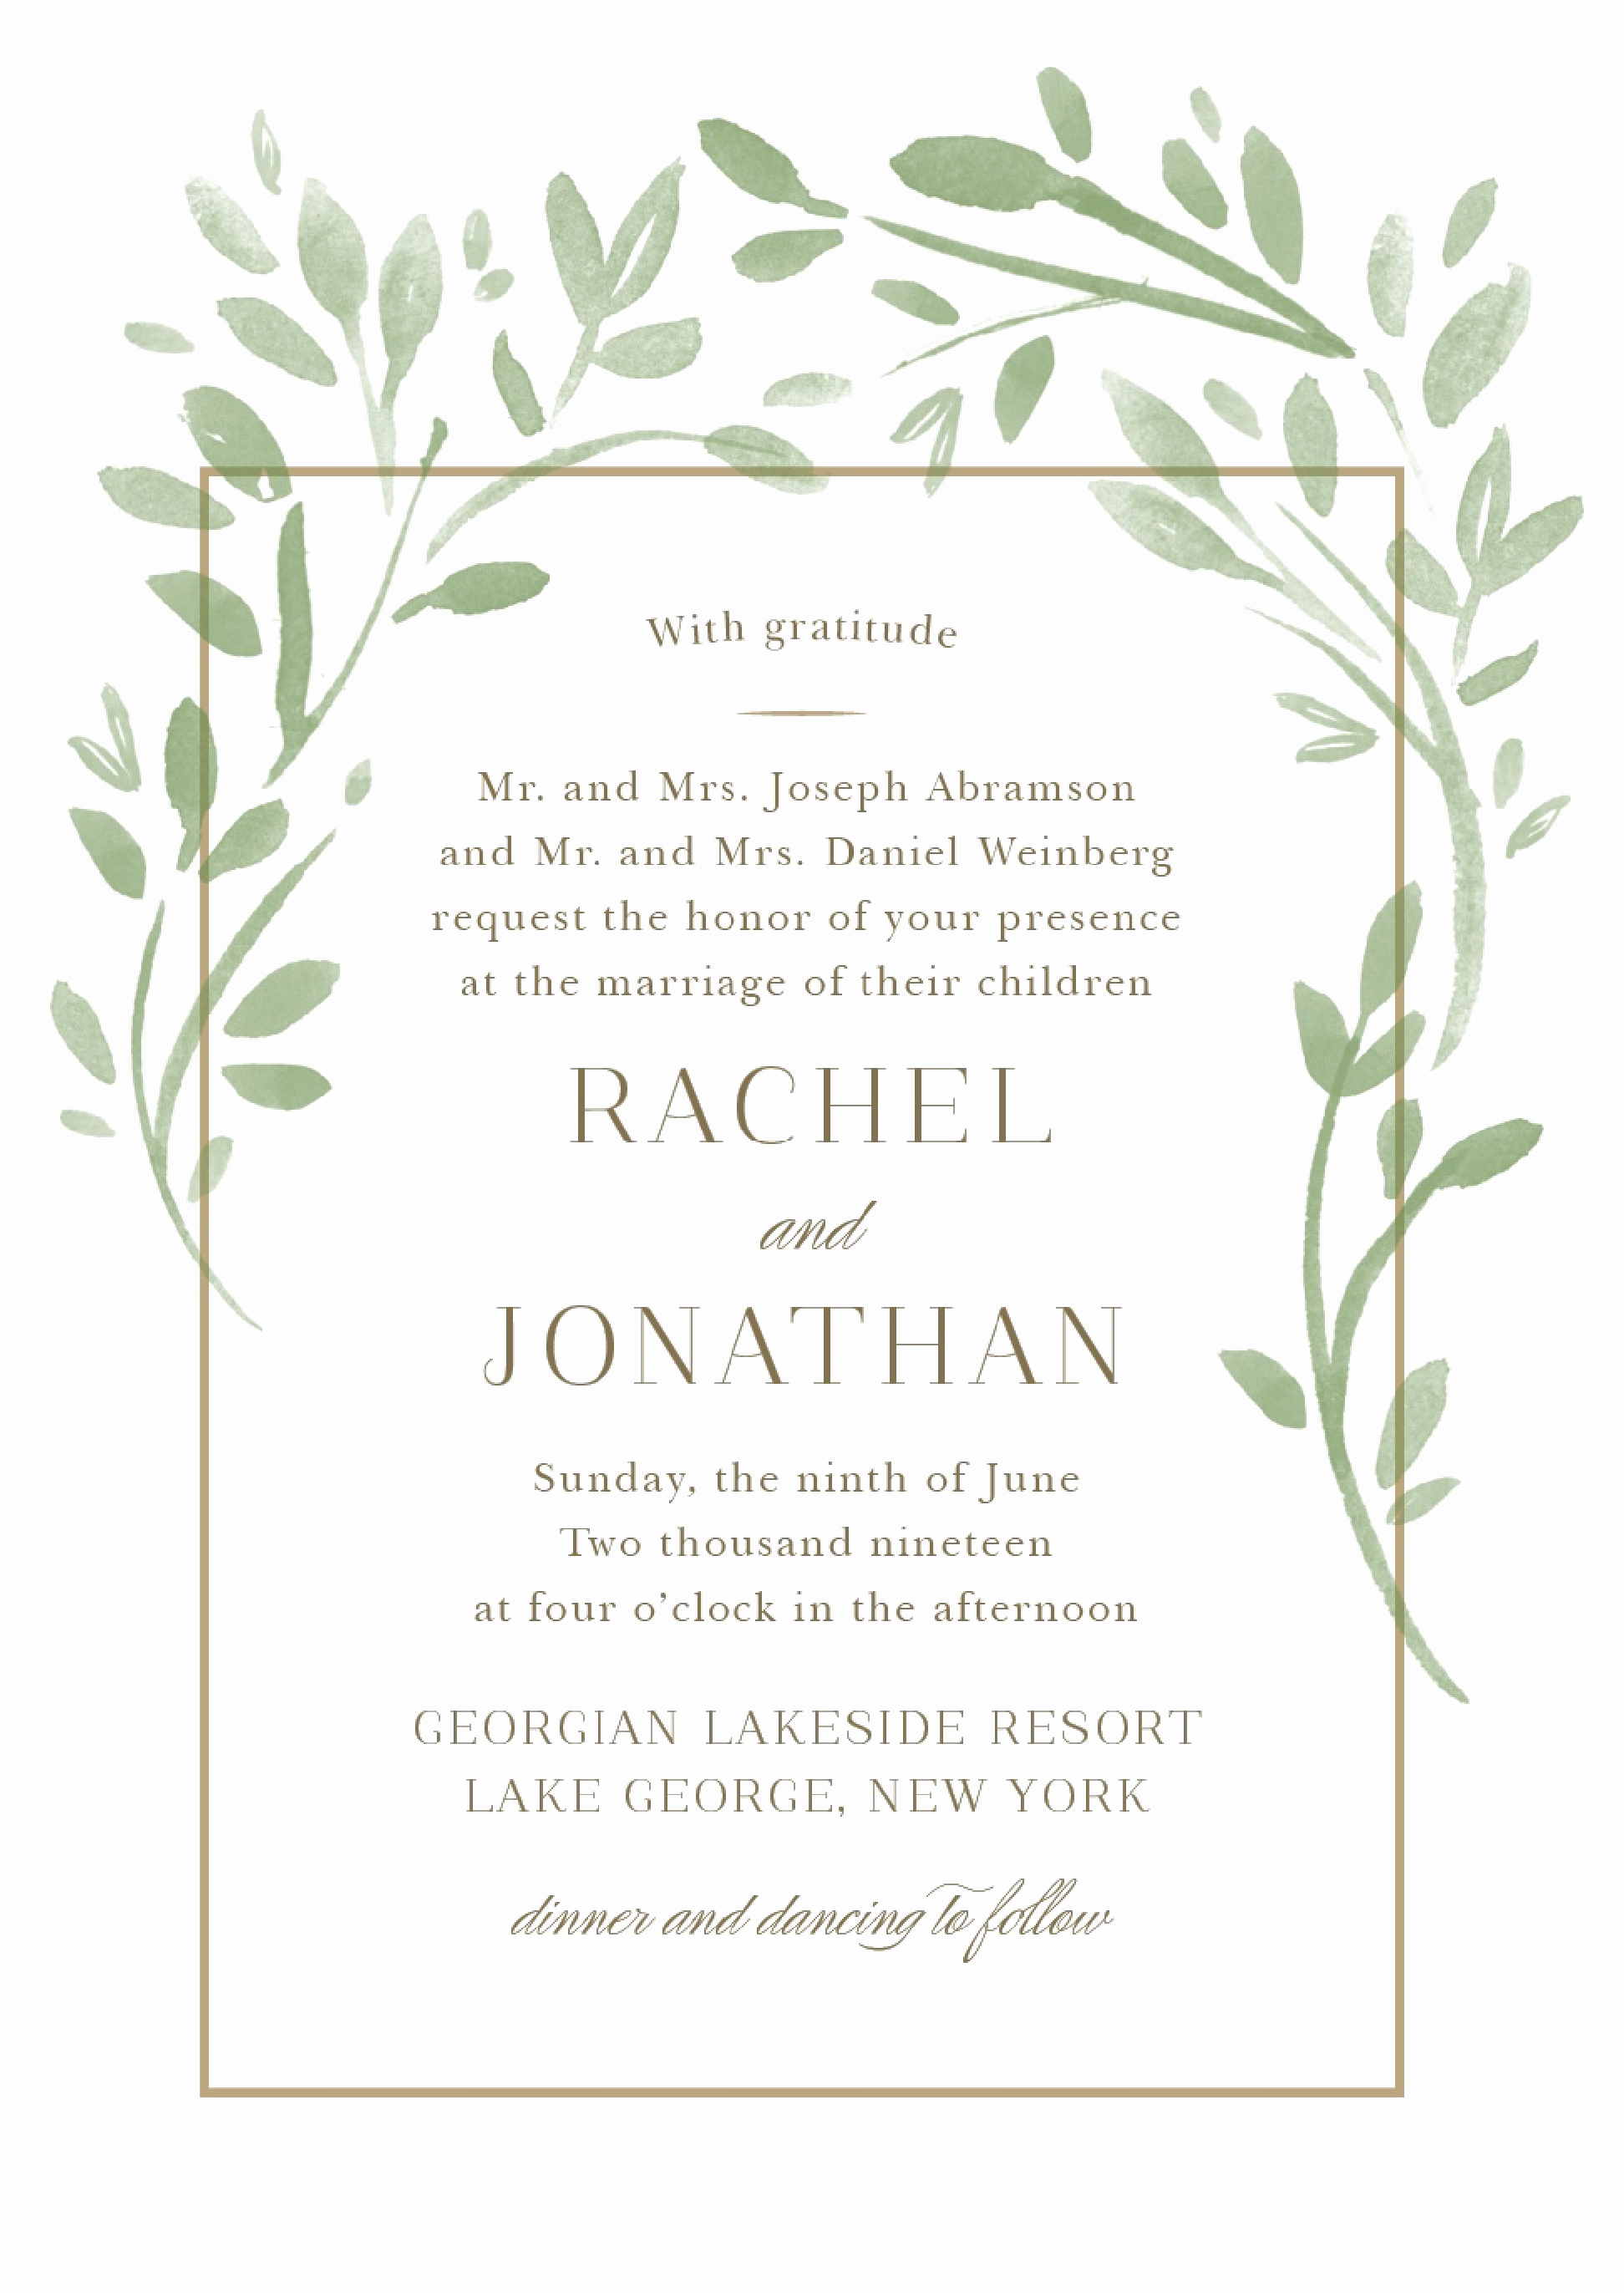 Sample Wedding Invitation Wording Best Of Wedding Invitation Wording Samples